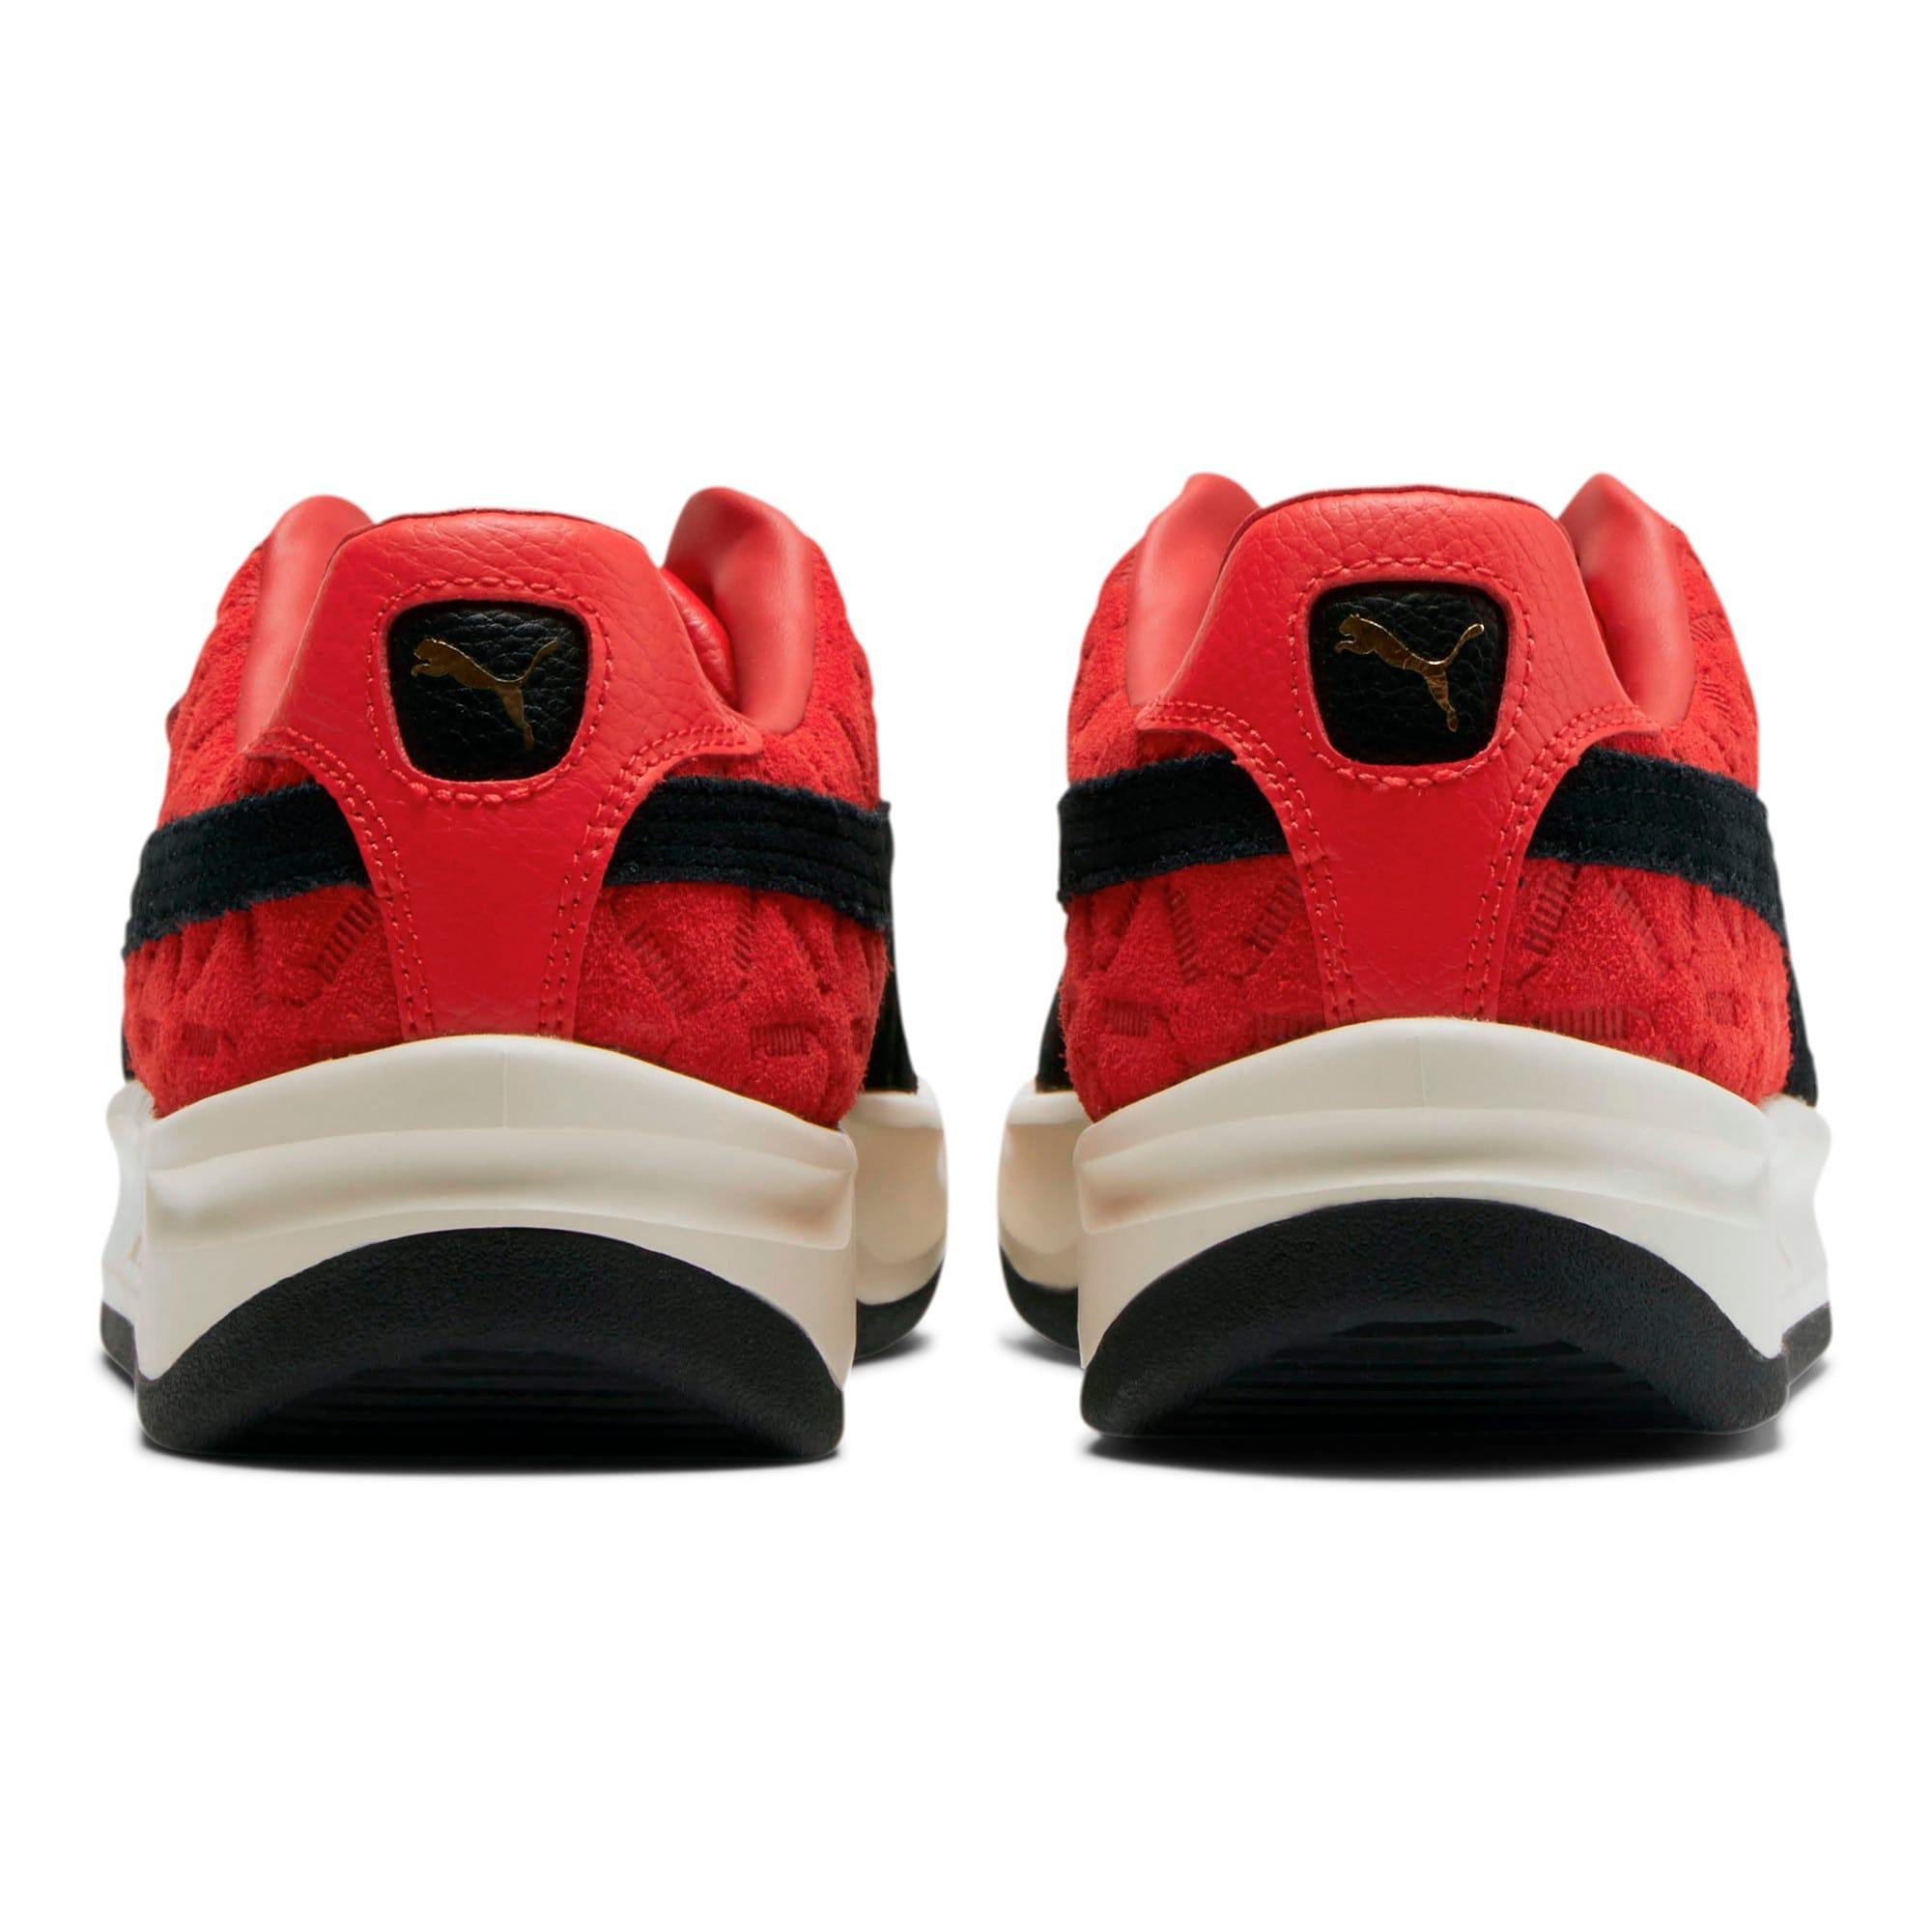 Miniatura 3 de Zapatos deportivos GV SpecialLux, HighRiskRed-P Blk-WhisperWht, mediano